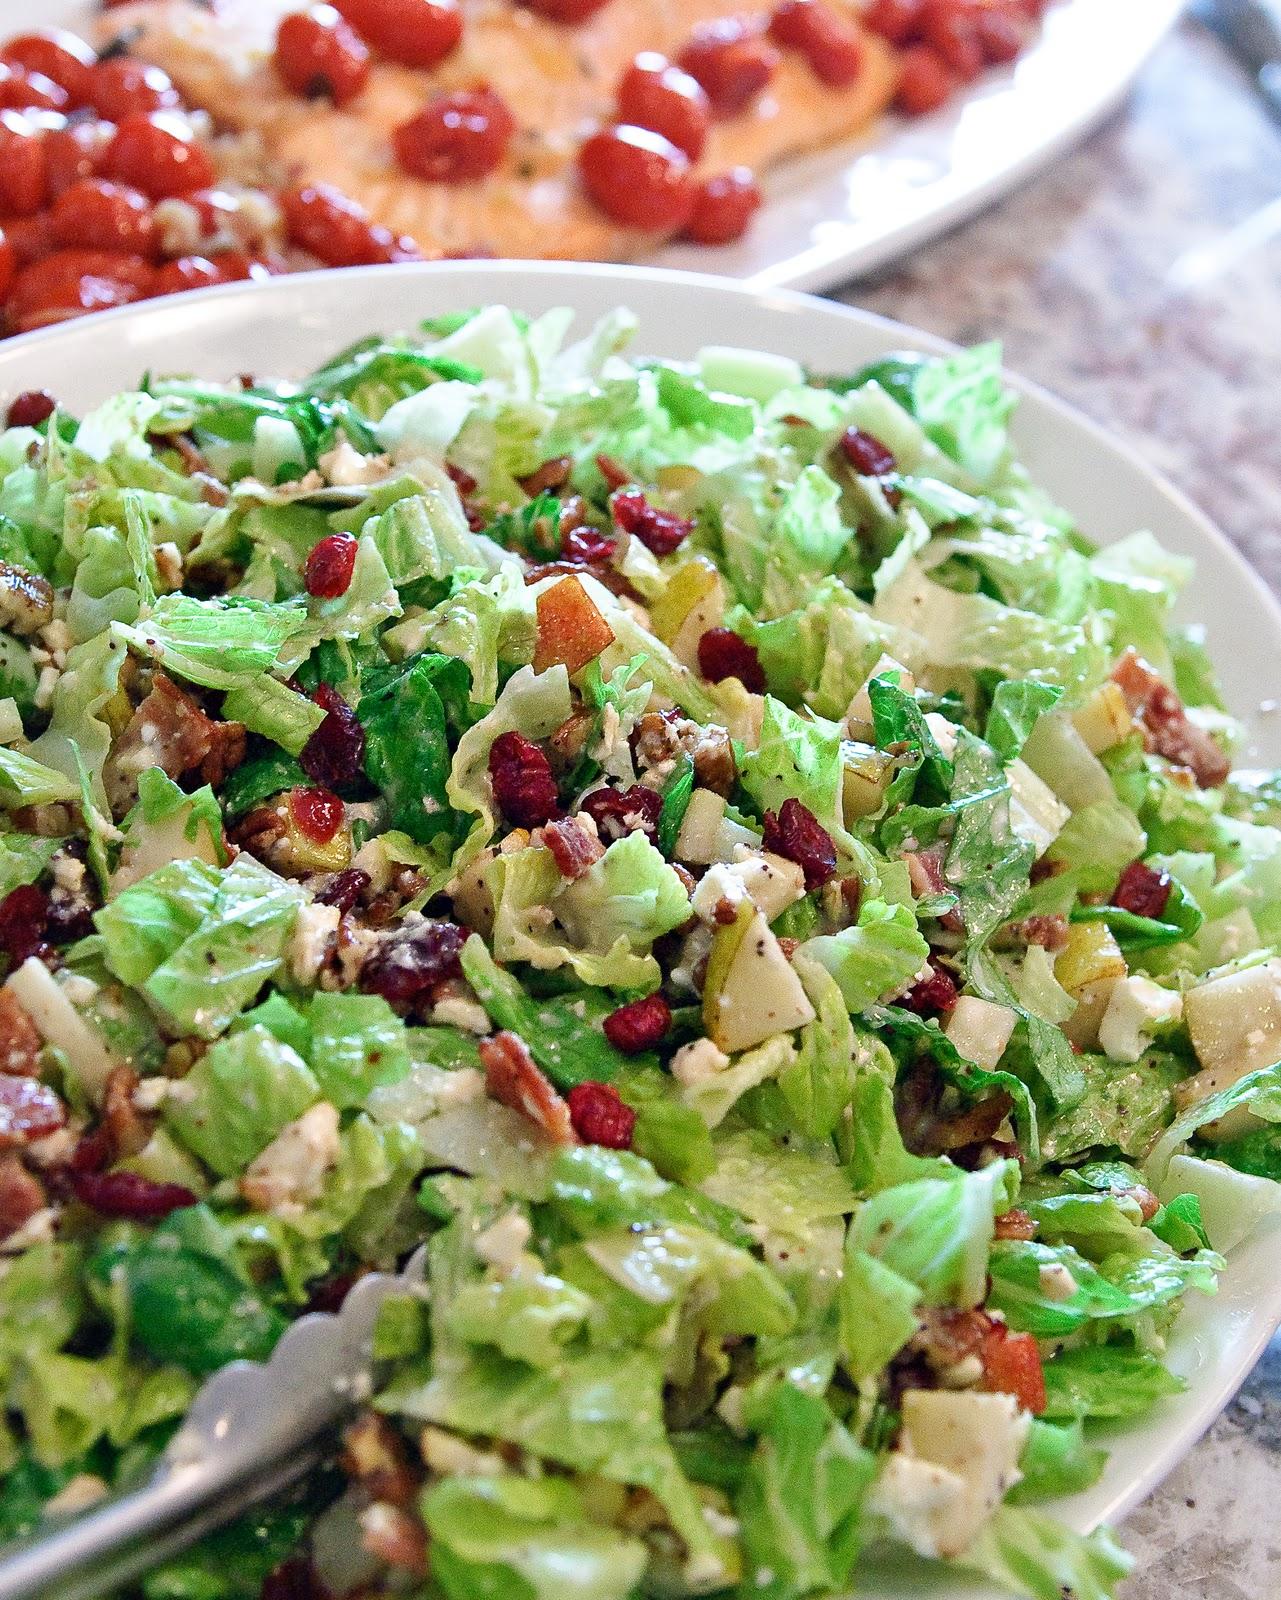 Sounds deelish! Great Thanksgiving Salad. autumn chopped salad